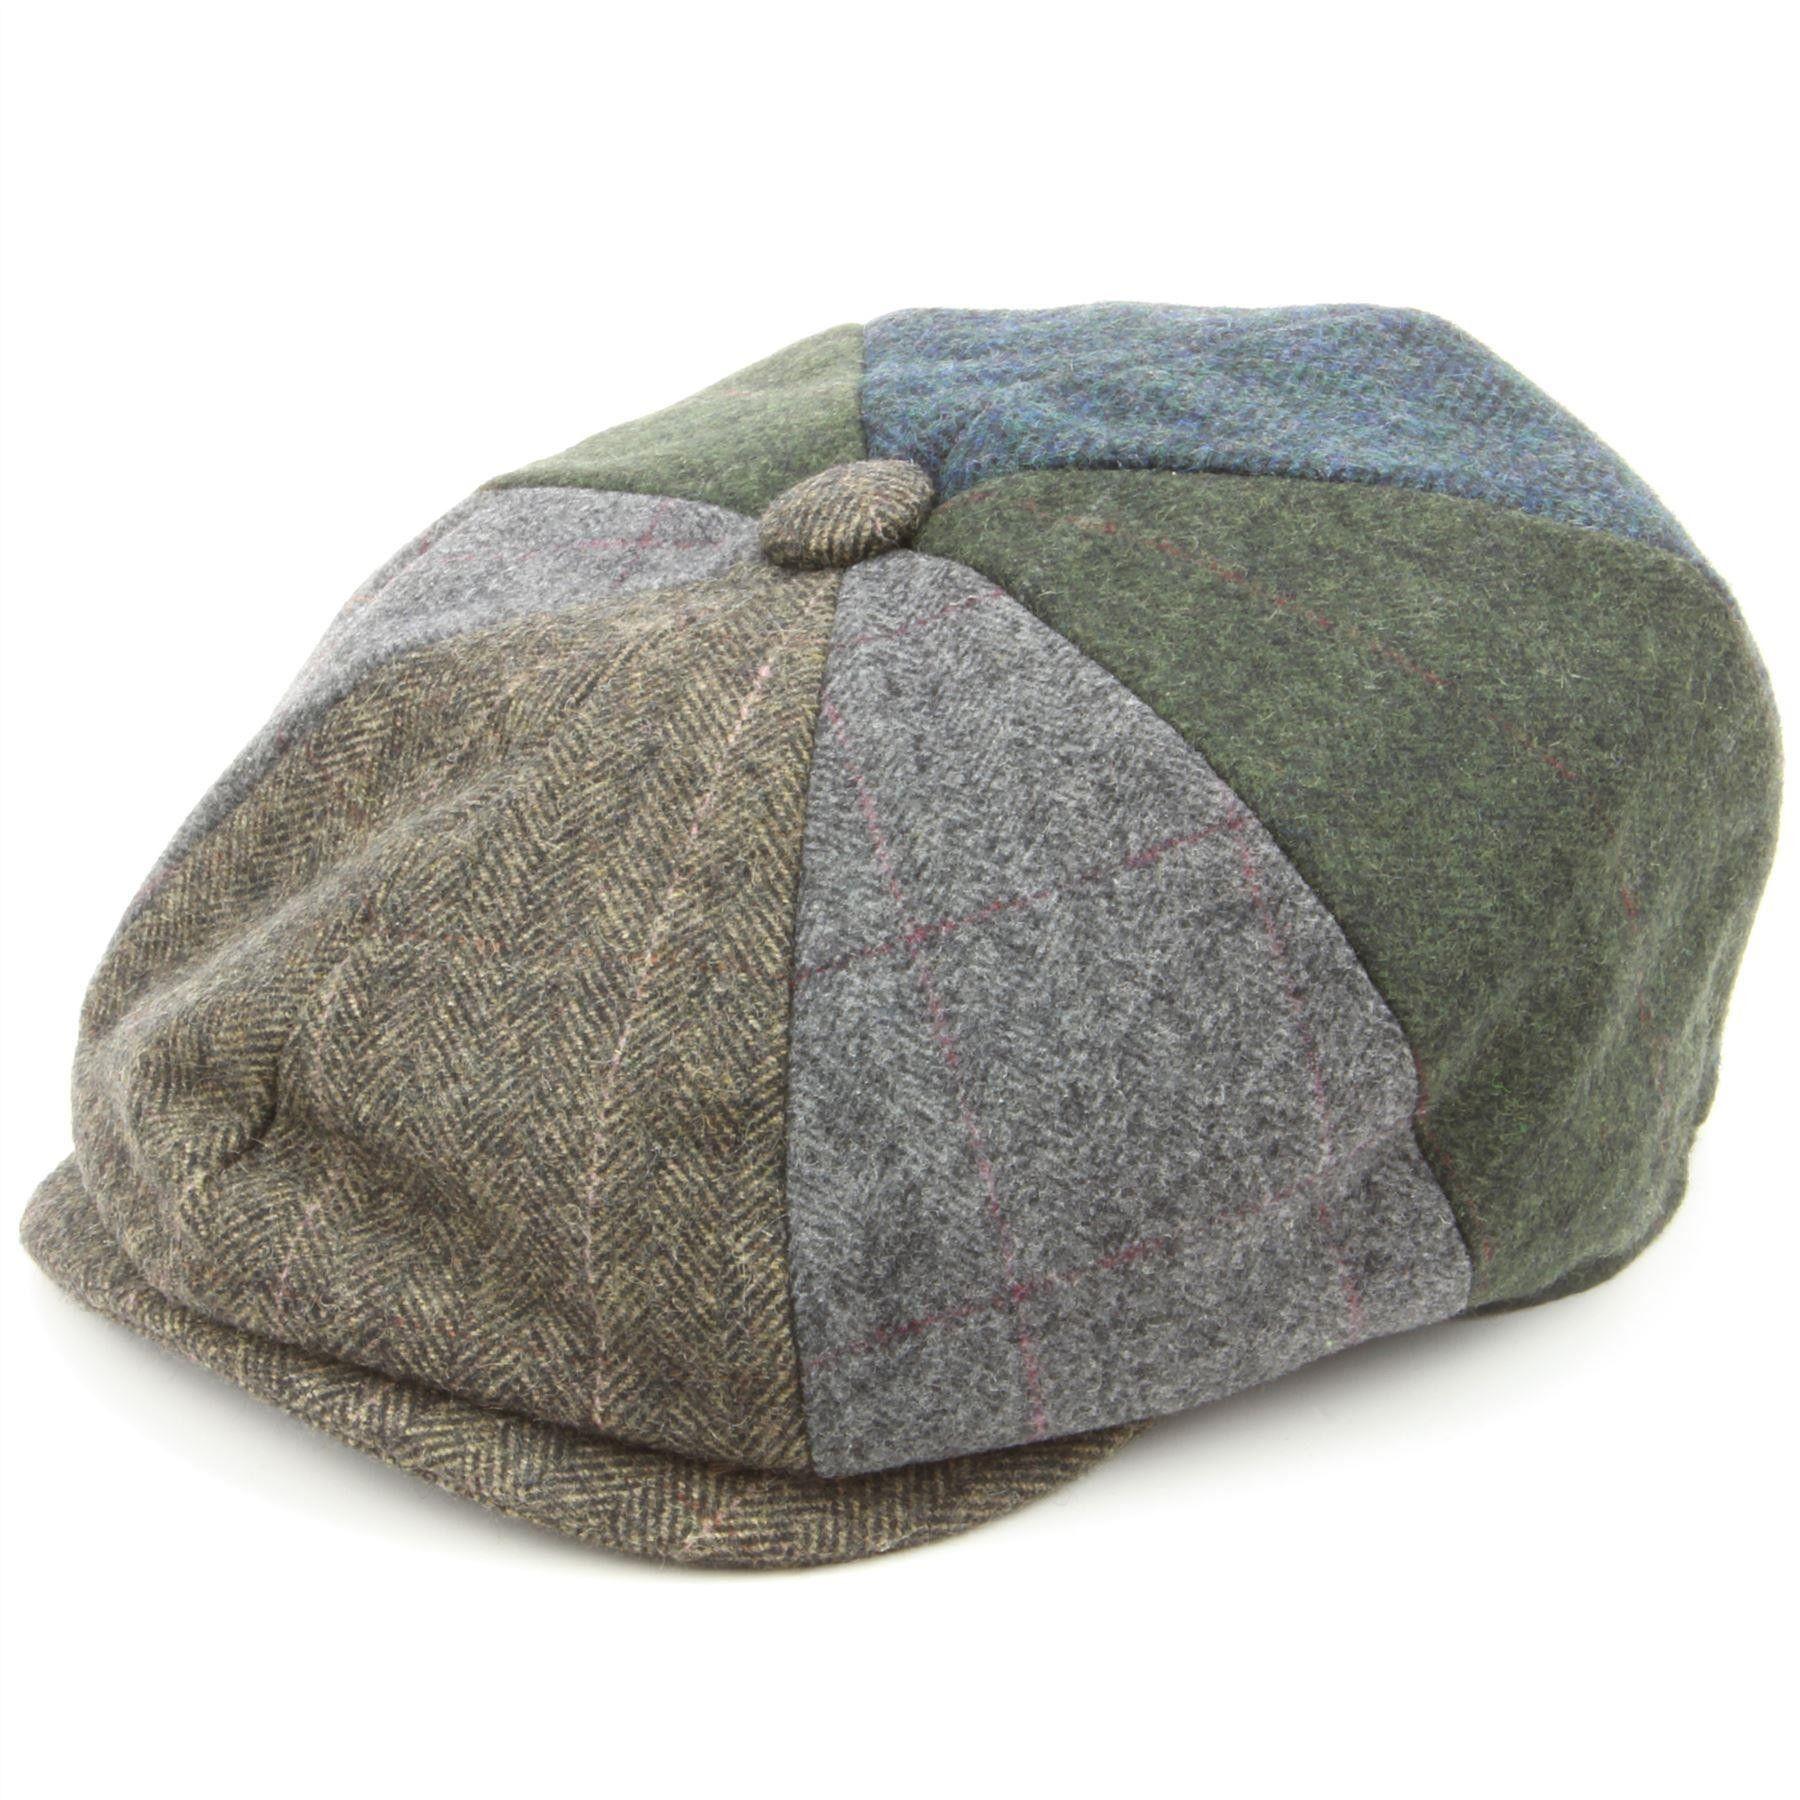 dd21efb54c3 Hawkins Patchwork Tweed Newsboy Gatsby 8 panel flat cap - Blue - Flat Caps  - Hats